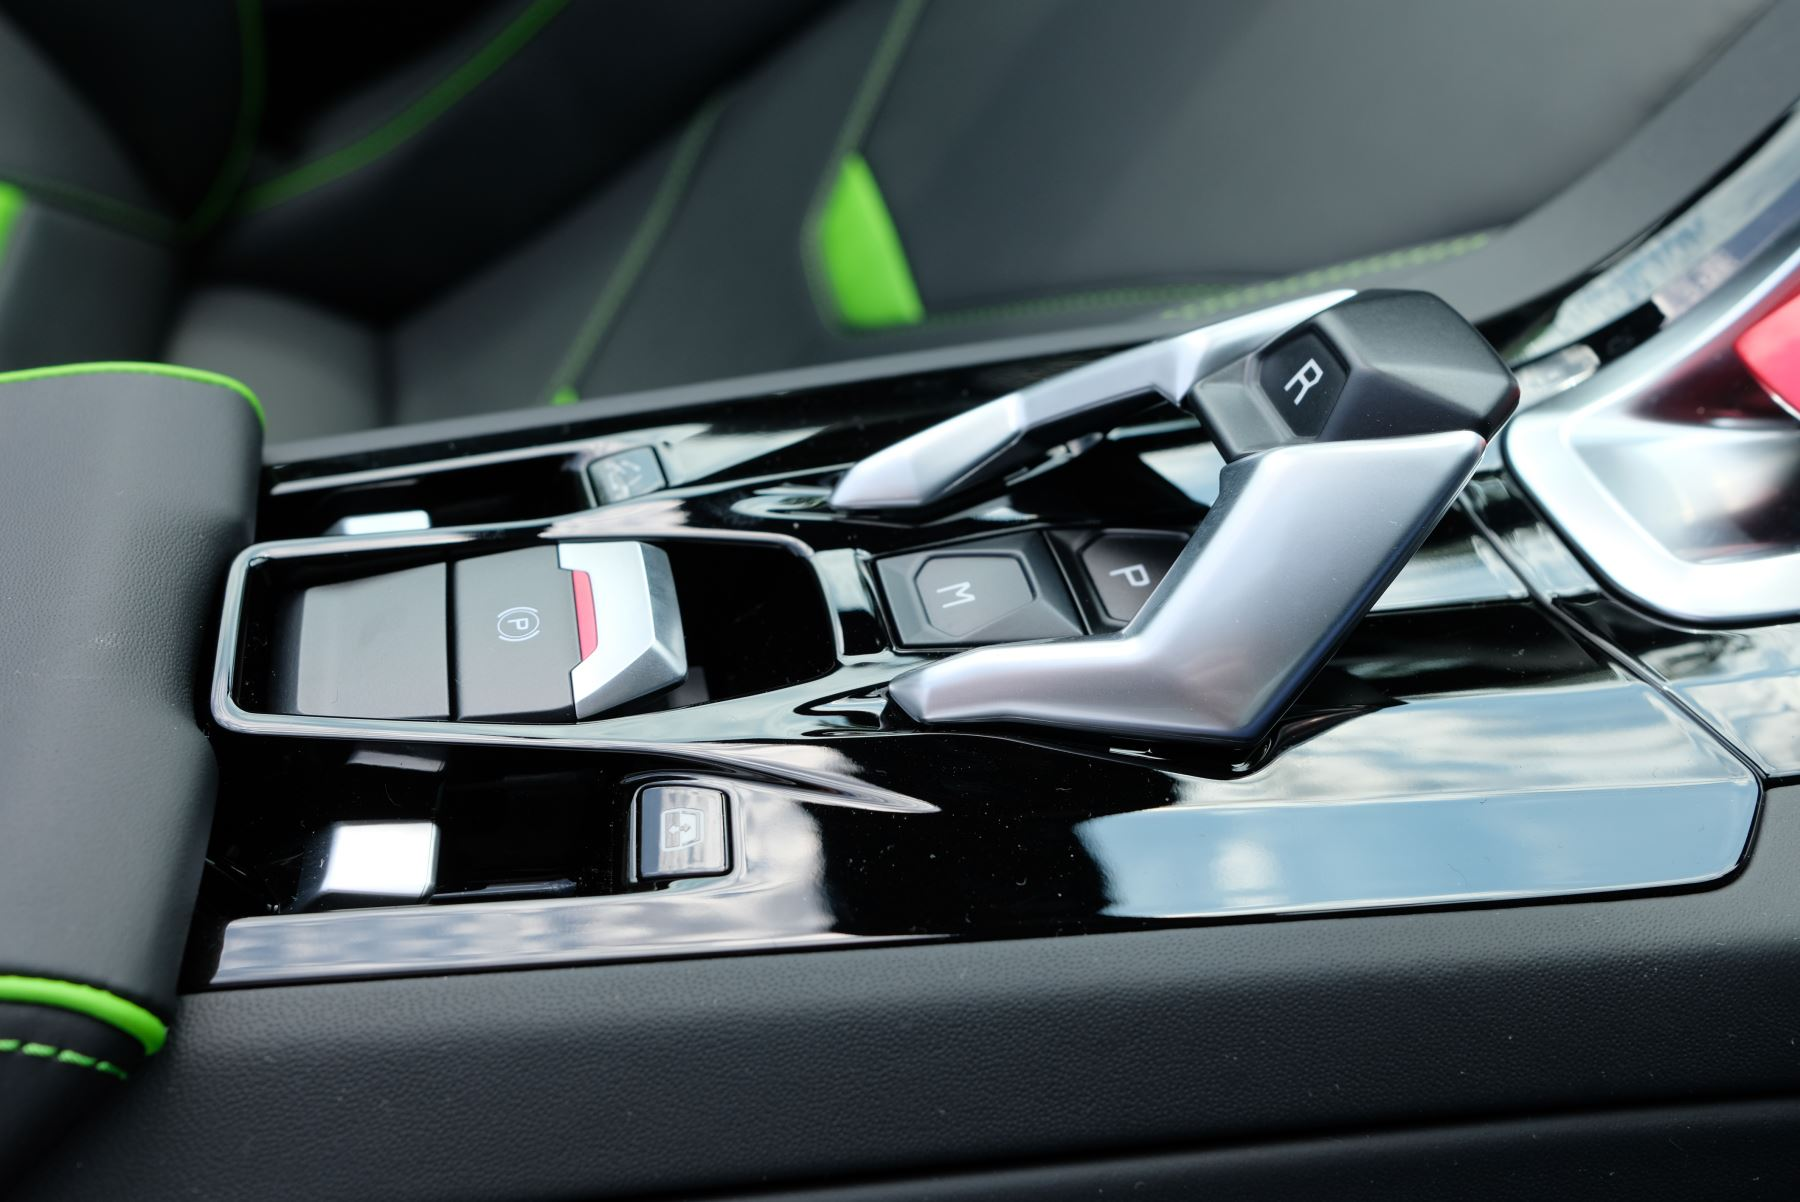 Lamborghini Huracan EVO Spyder 5.2 V10 640 2dr Auto AWD image 22